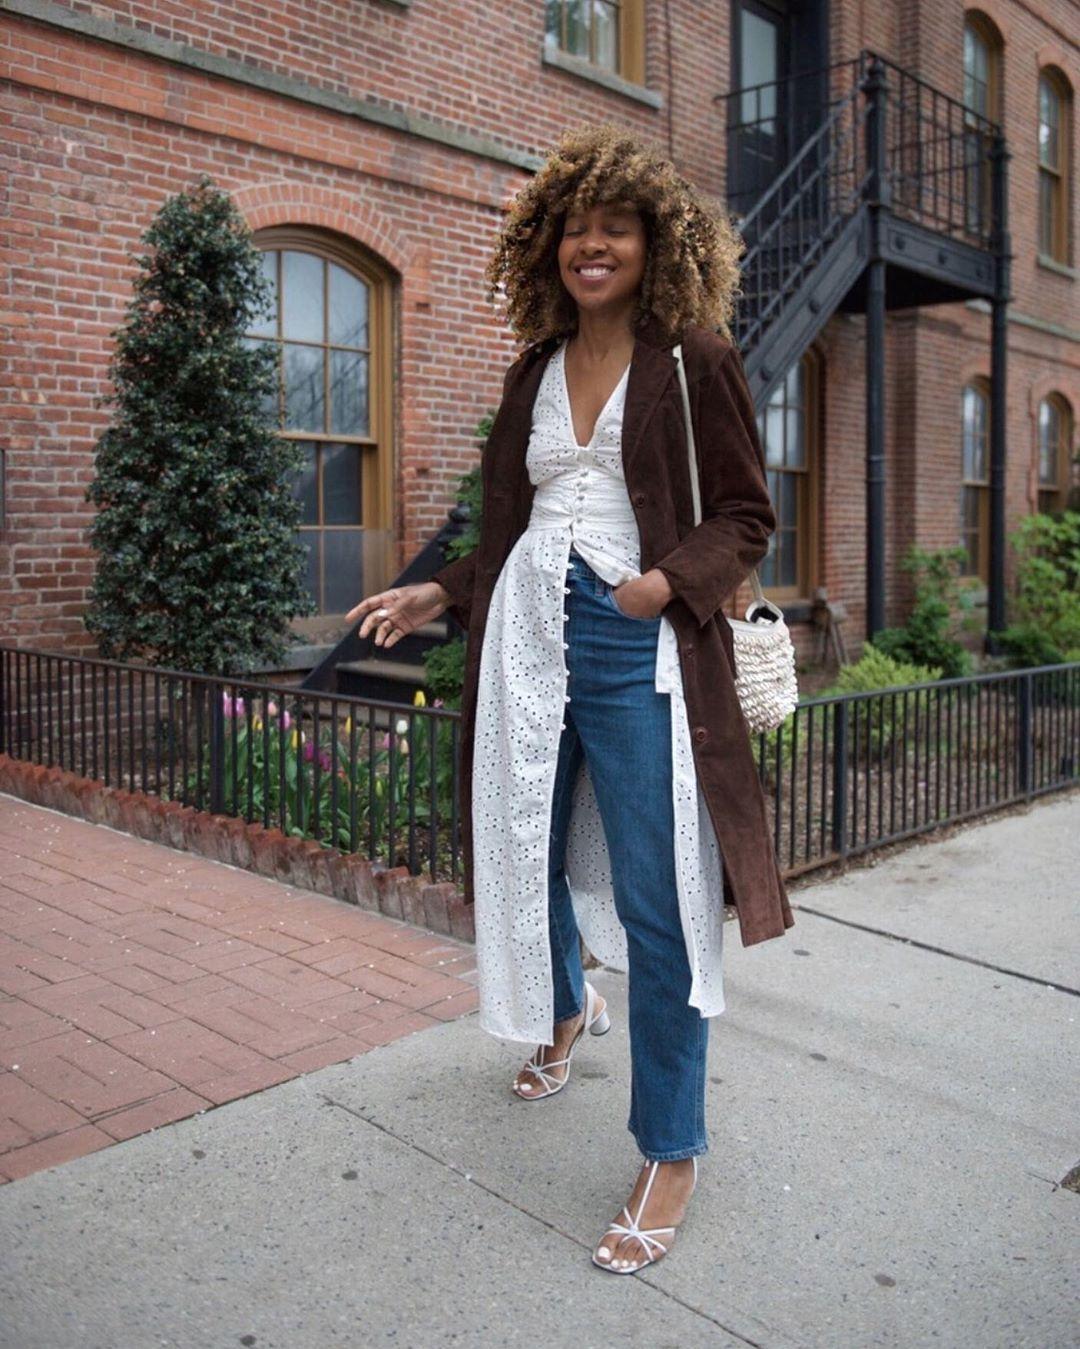 Dress, 40£ at Zara – Wheretoget